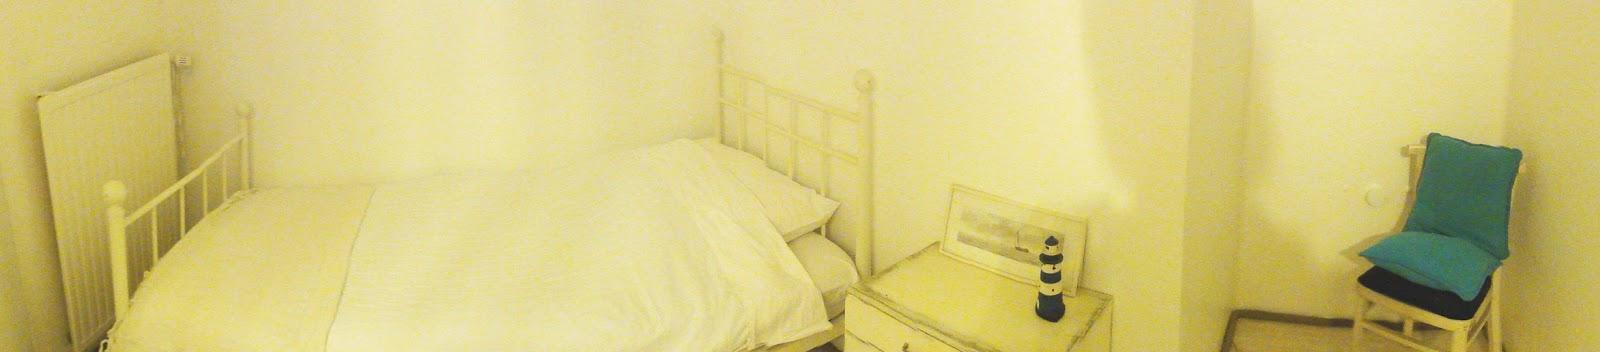 shabby chic brocante wei en flur wei e zimmer. Black Bedroom Furniture Sets. Home Design Ideas